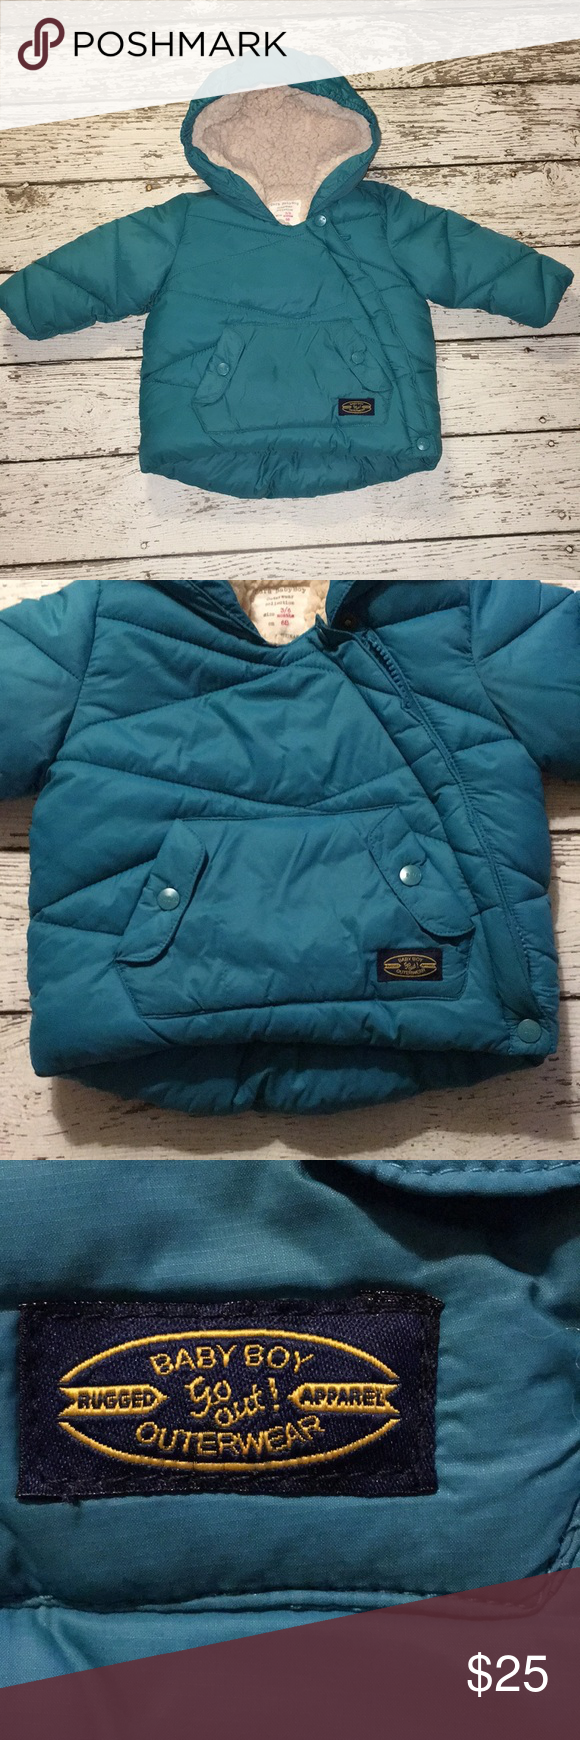 Zara Baby Boy elbow patch Coat Outerwear 3 6 mos Coat is ...